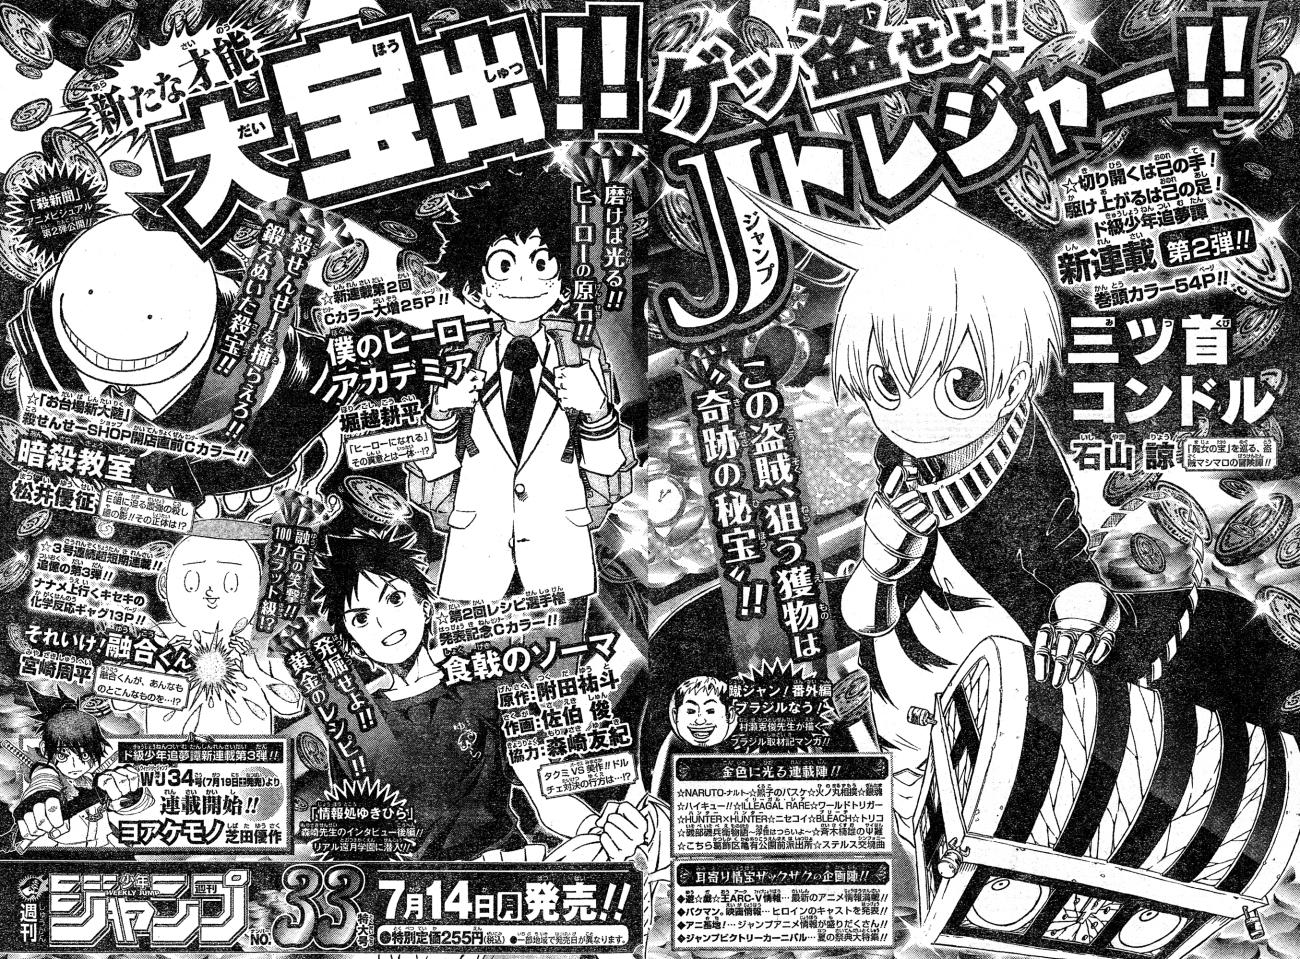 Dans Weekly Shonen Jump #33